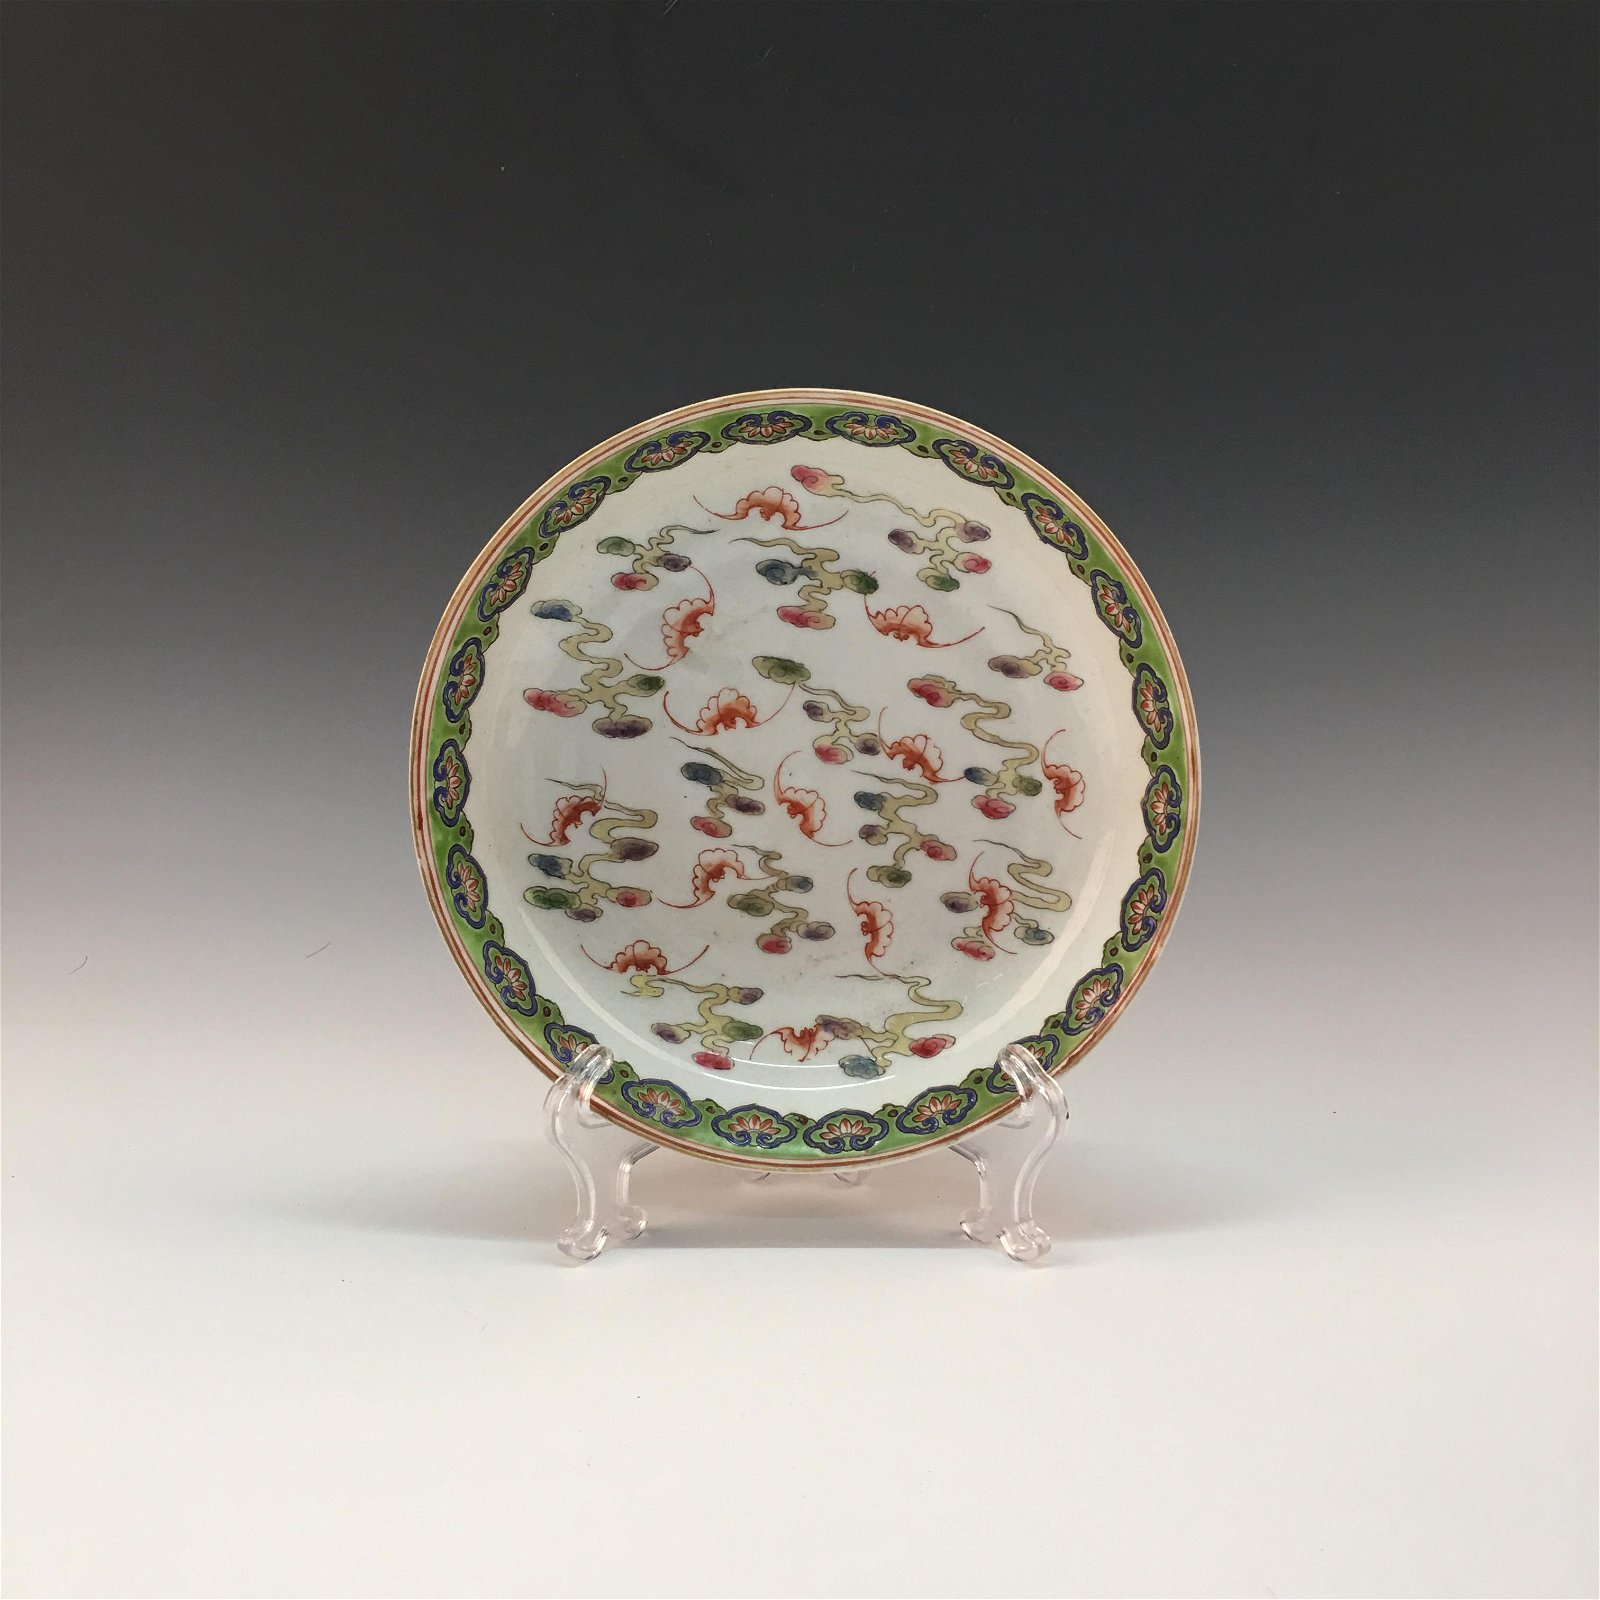 Chinese Famille Rose Plate, Guanxu Mark